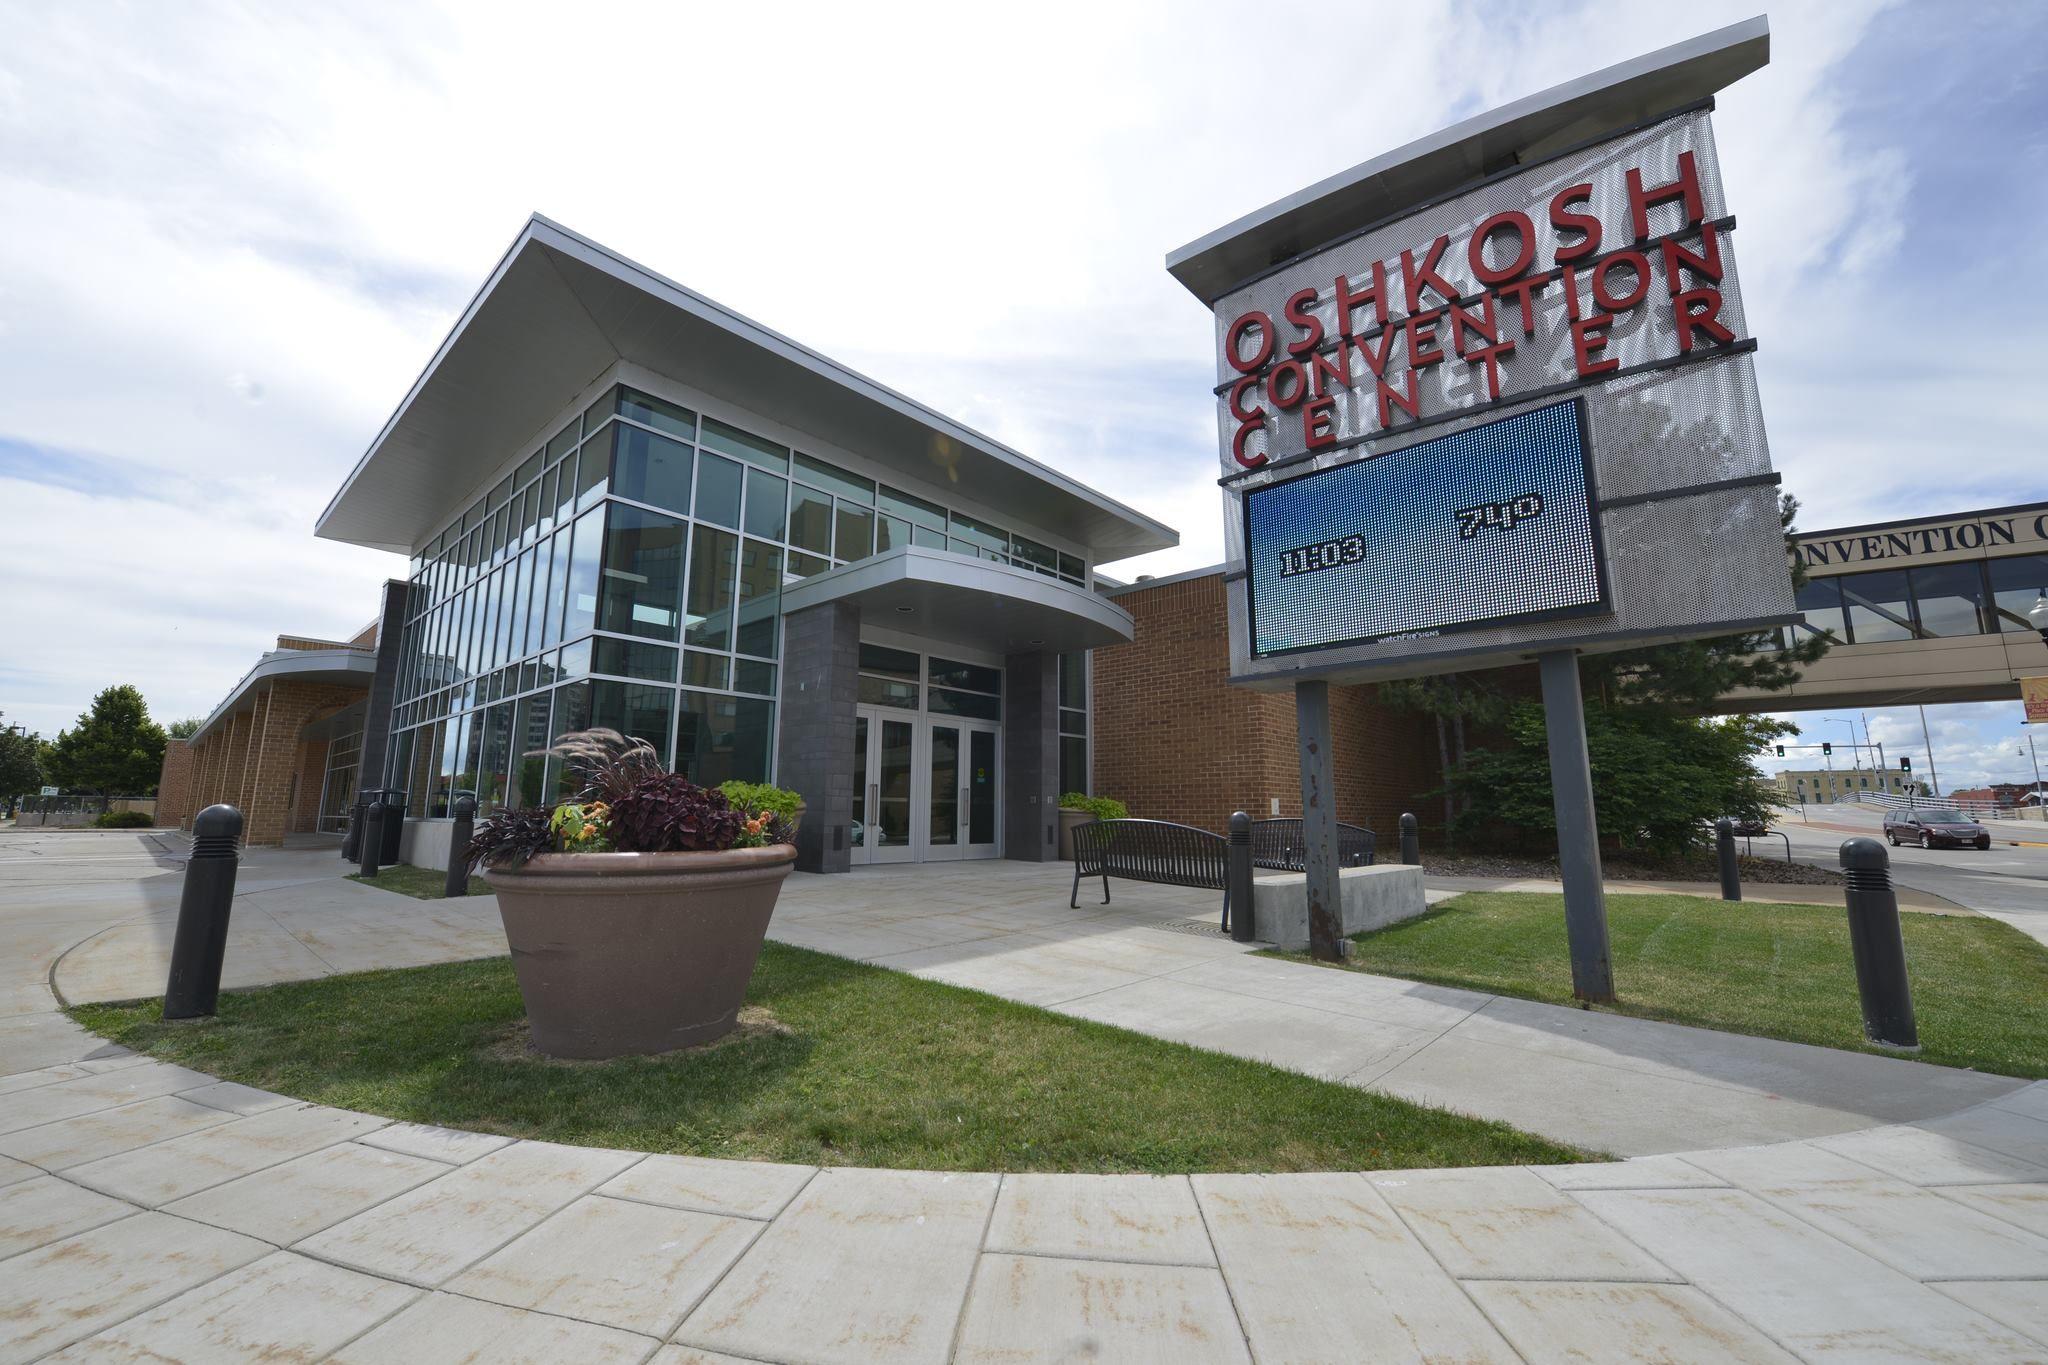 Oshkosh convention center conveniently located in